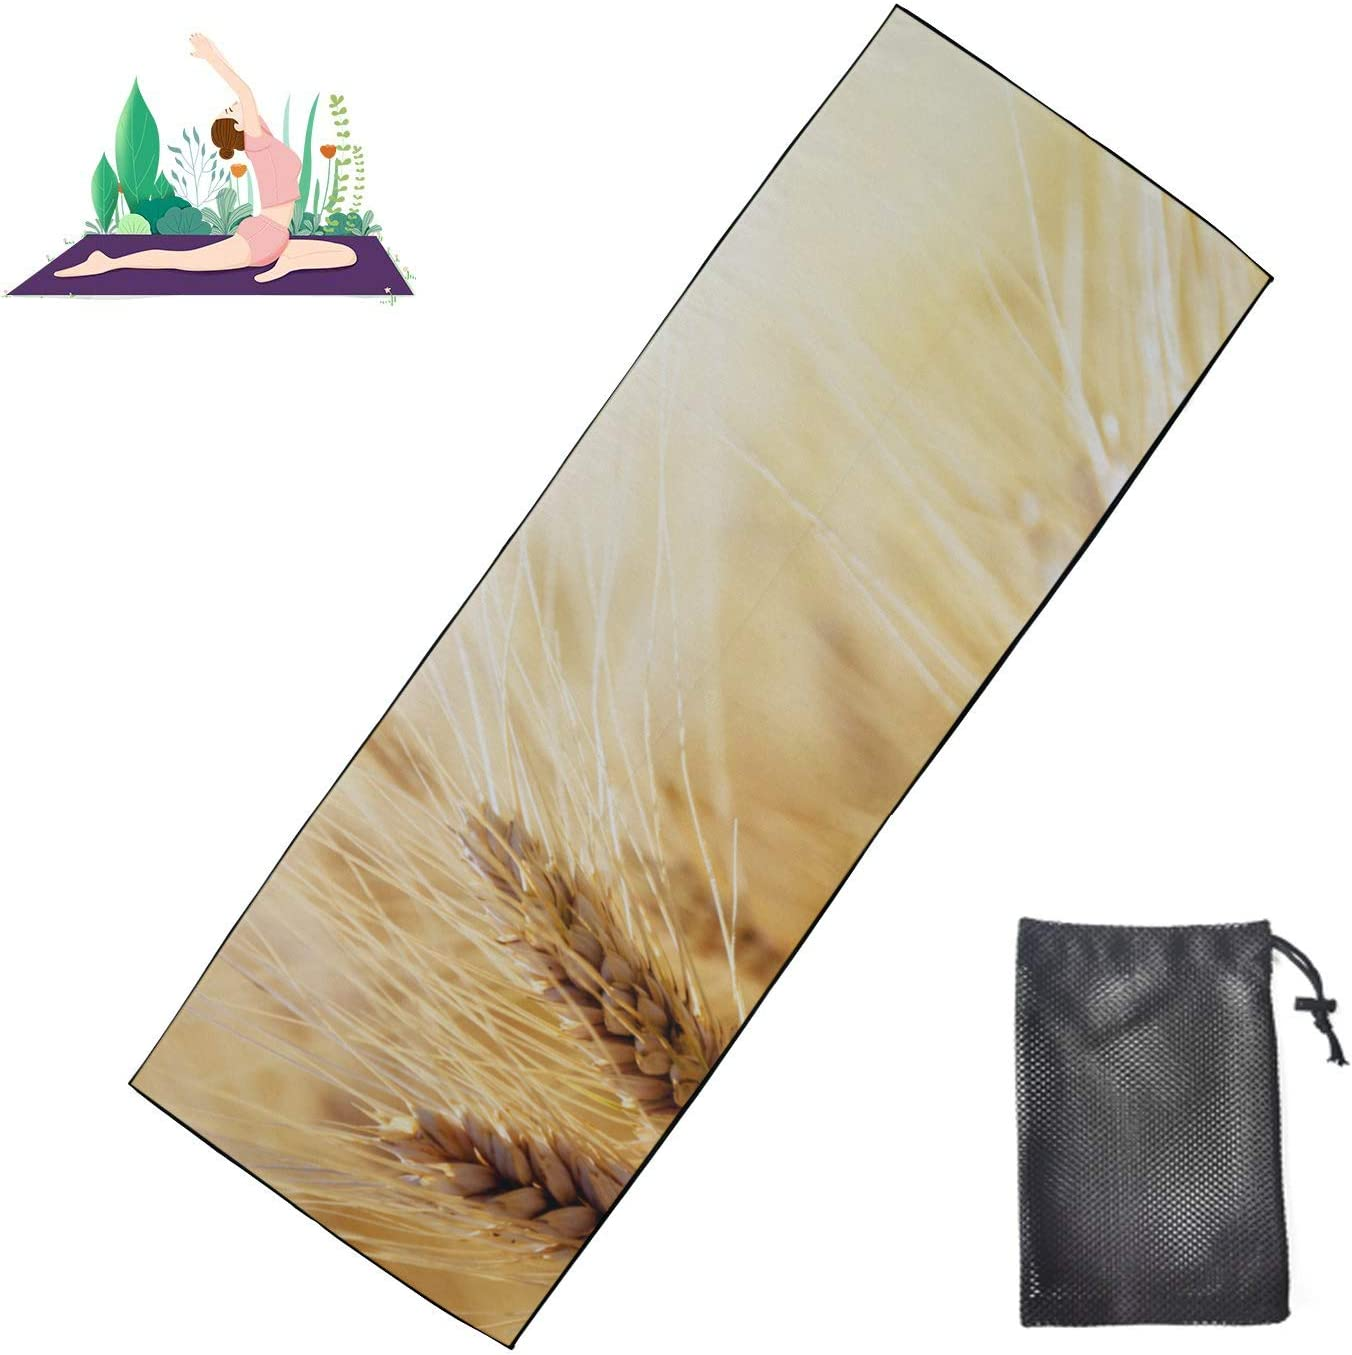 Huqalh Unique Max 74% OFF Yoga Finally resale start Mats Golden Field Peaceful Tow Hot Wheat